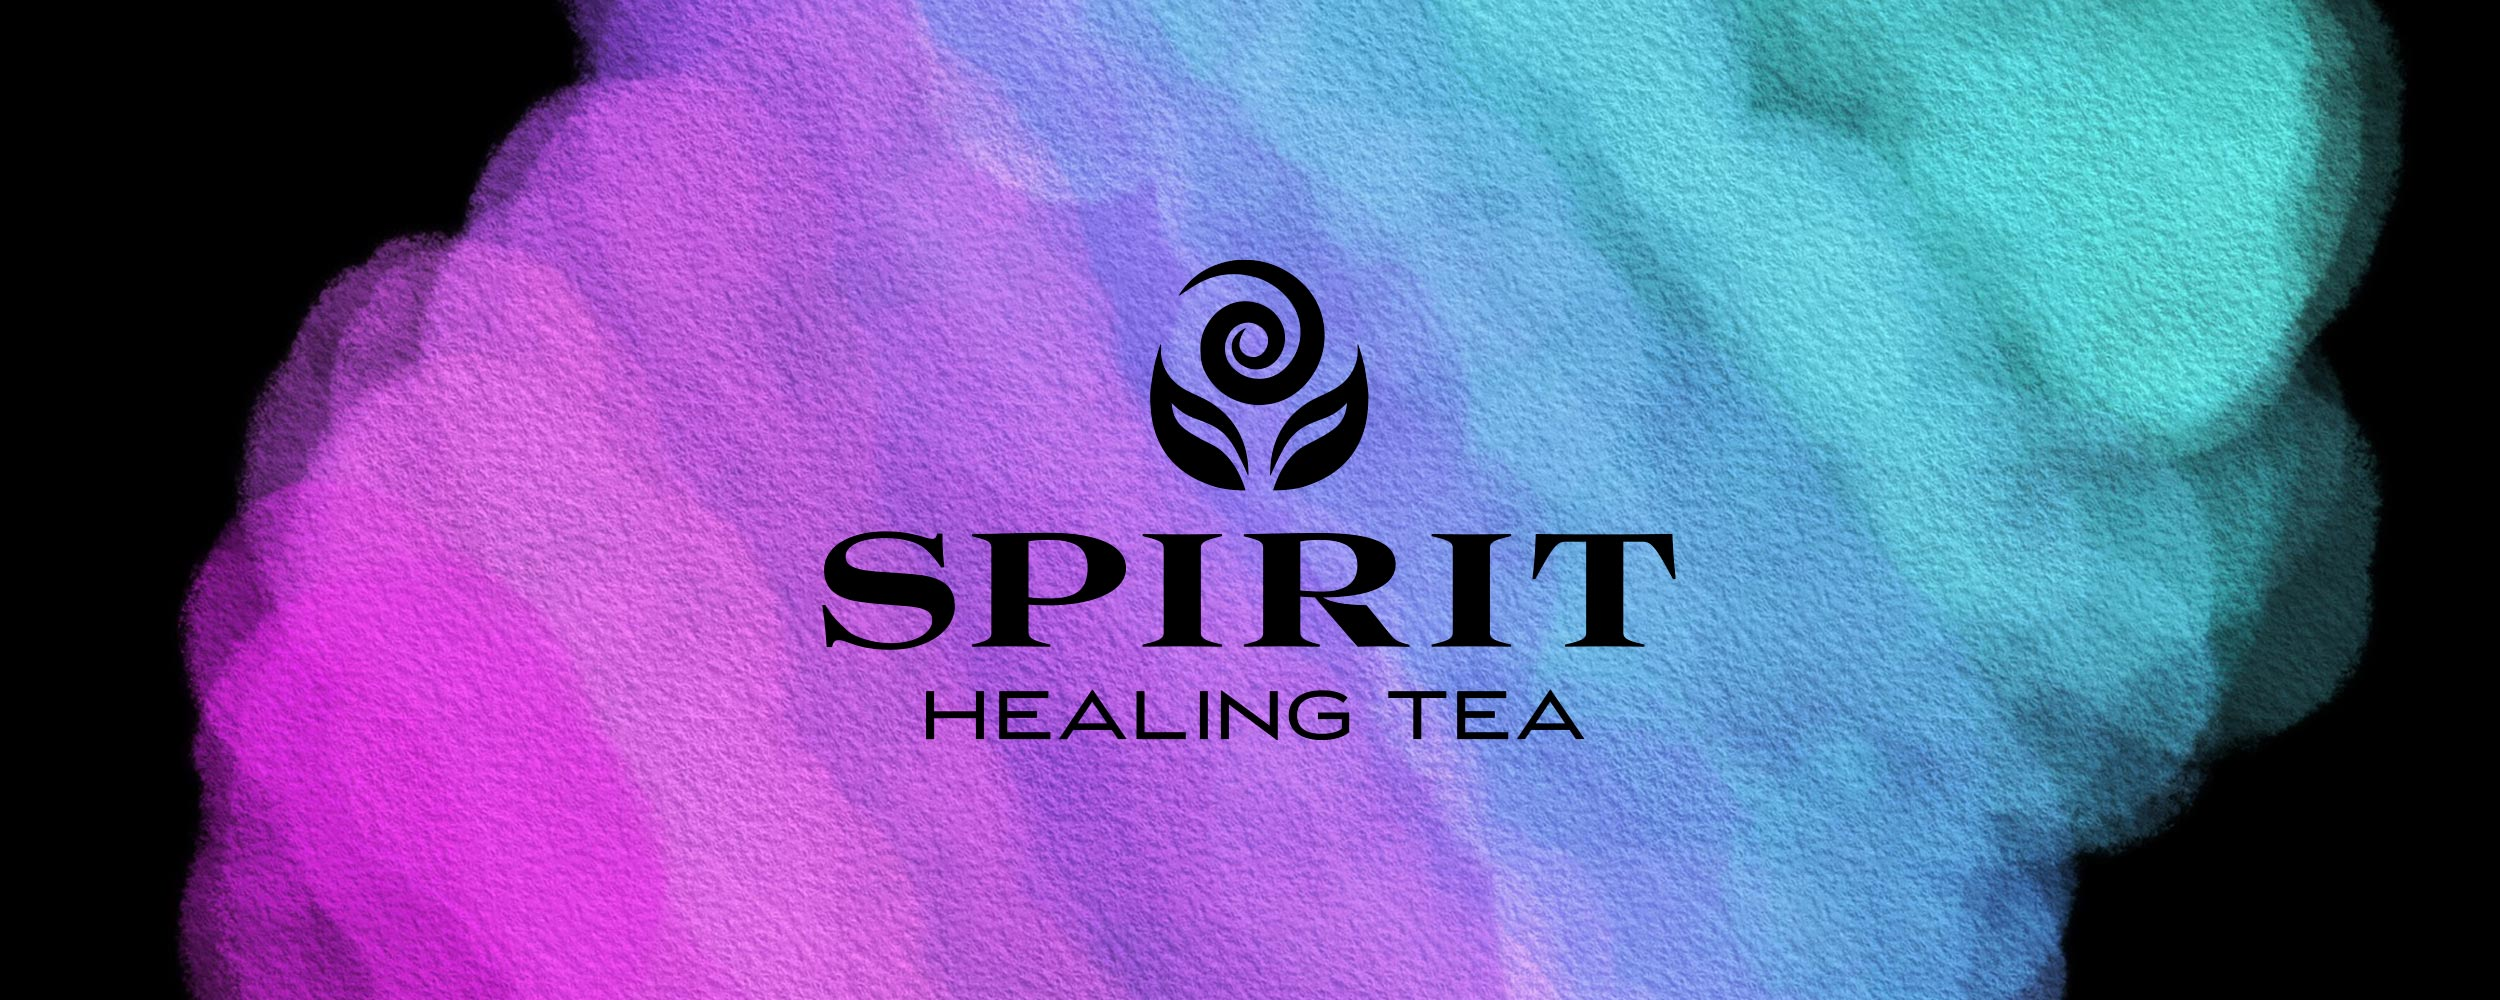 Spirit Healing Tea